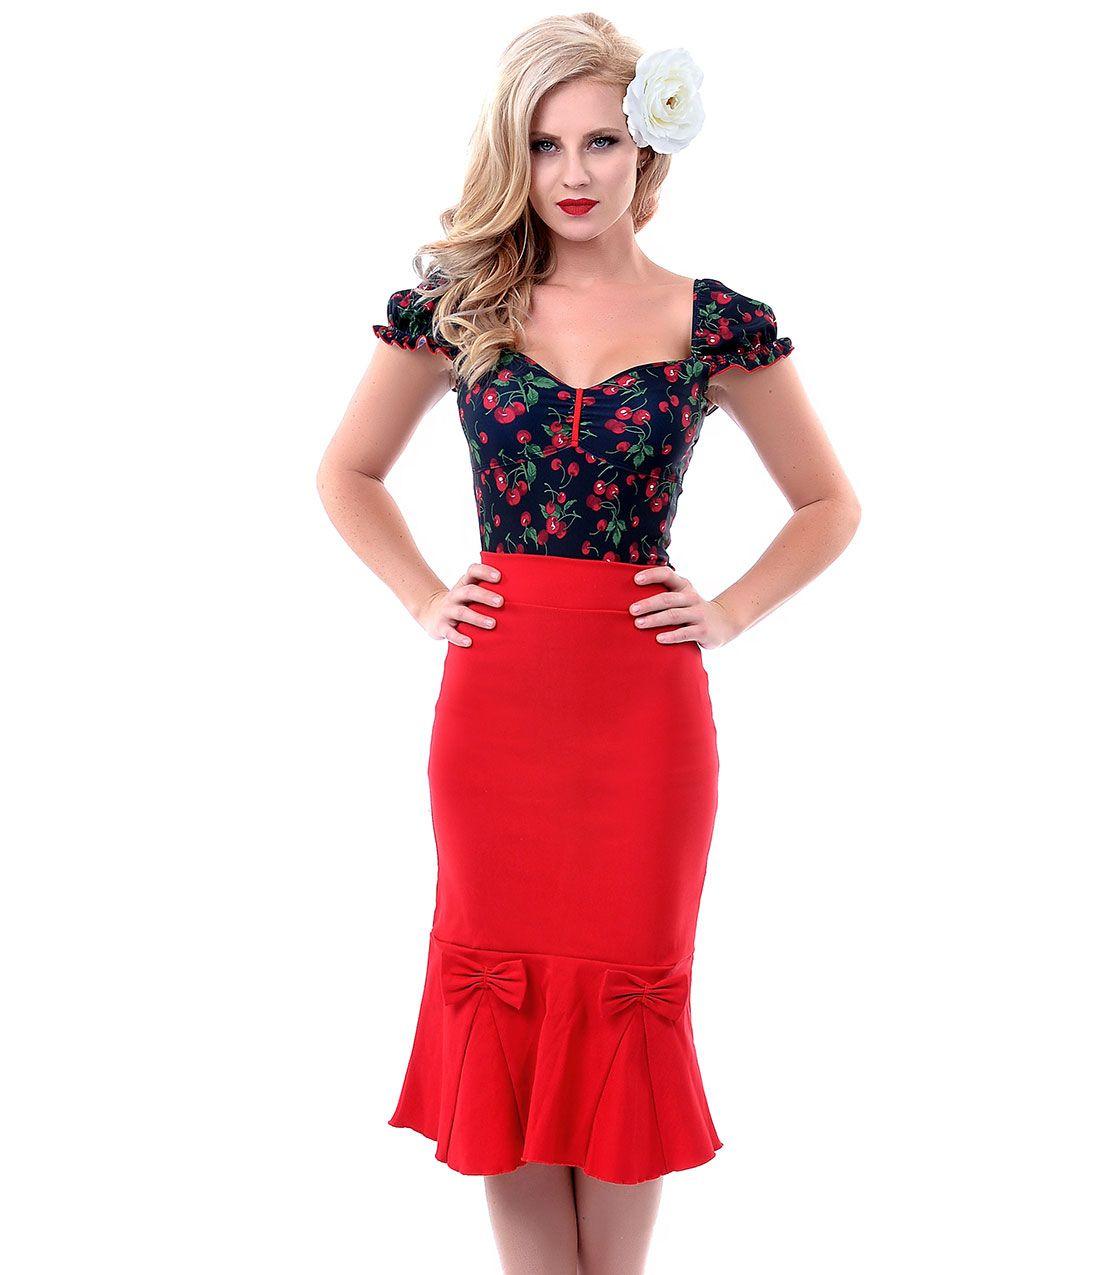 Vivian cap sleeve cherry top uniquevintage style whaaat